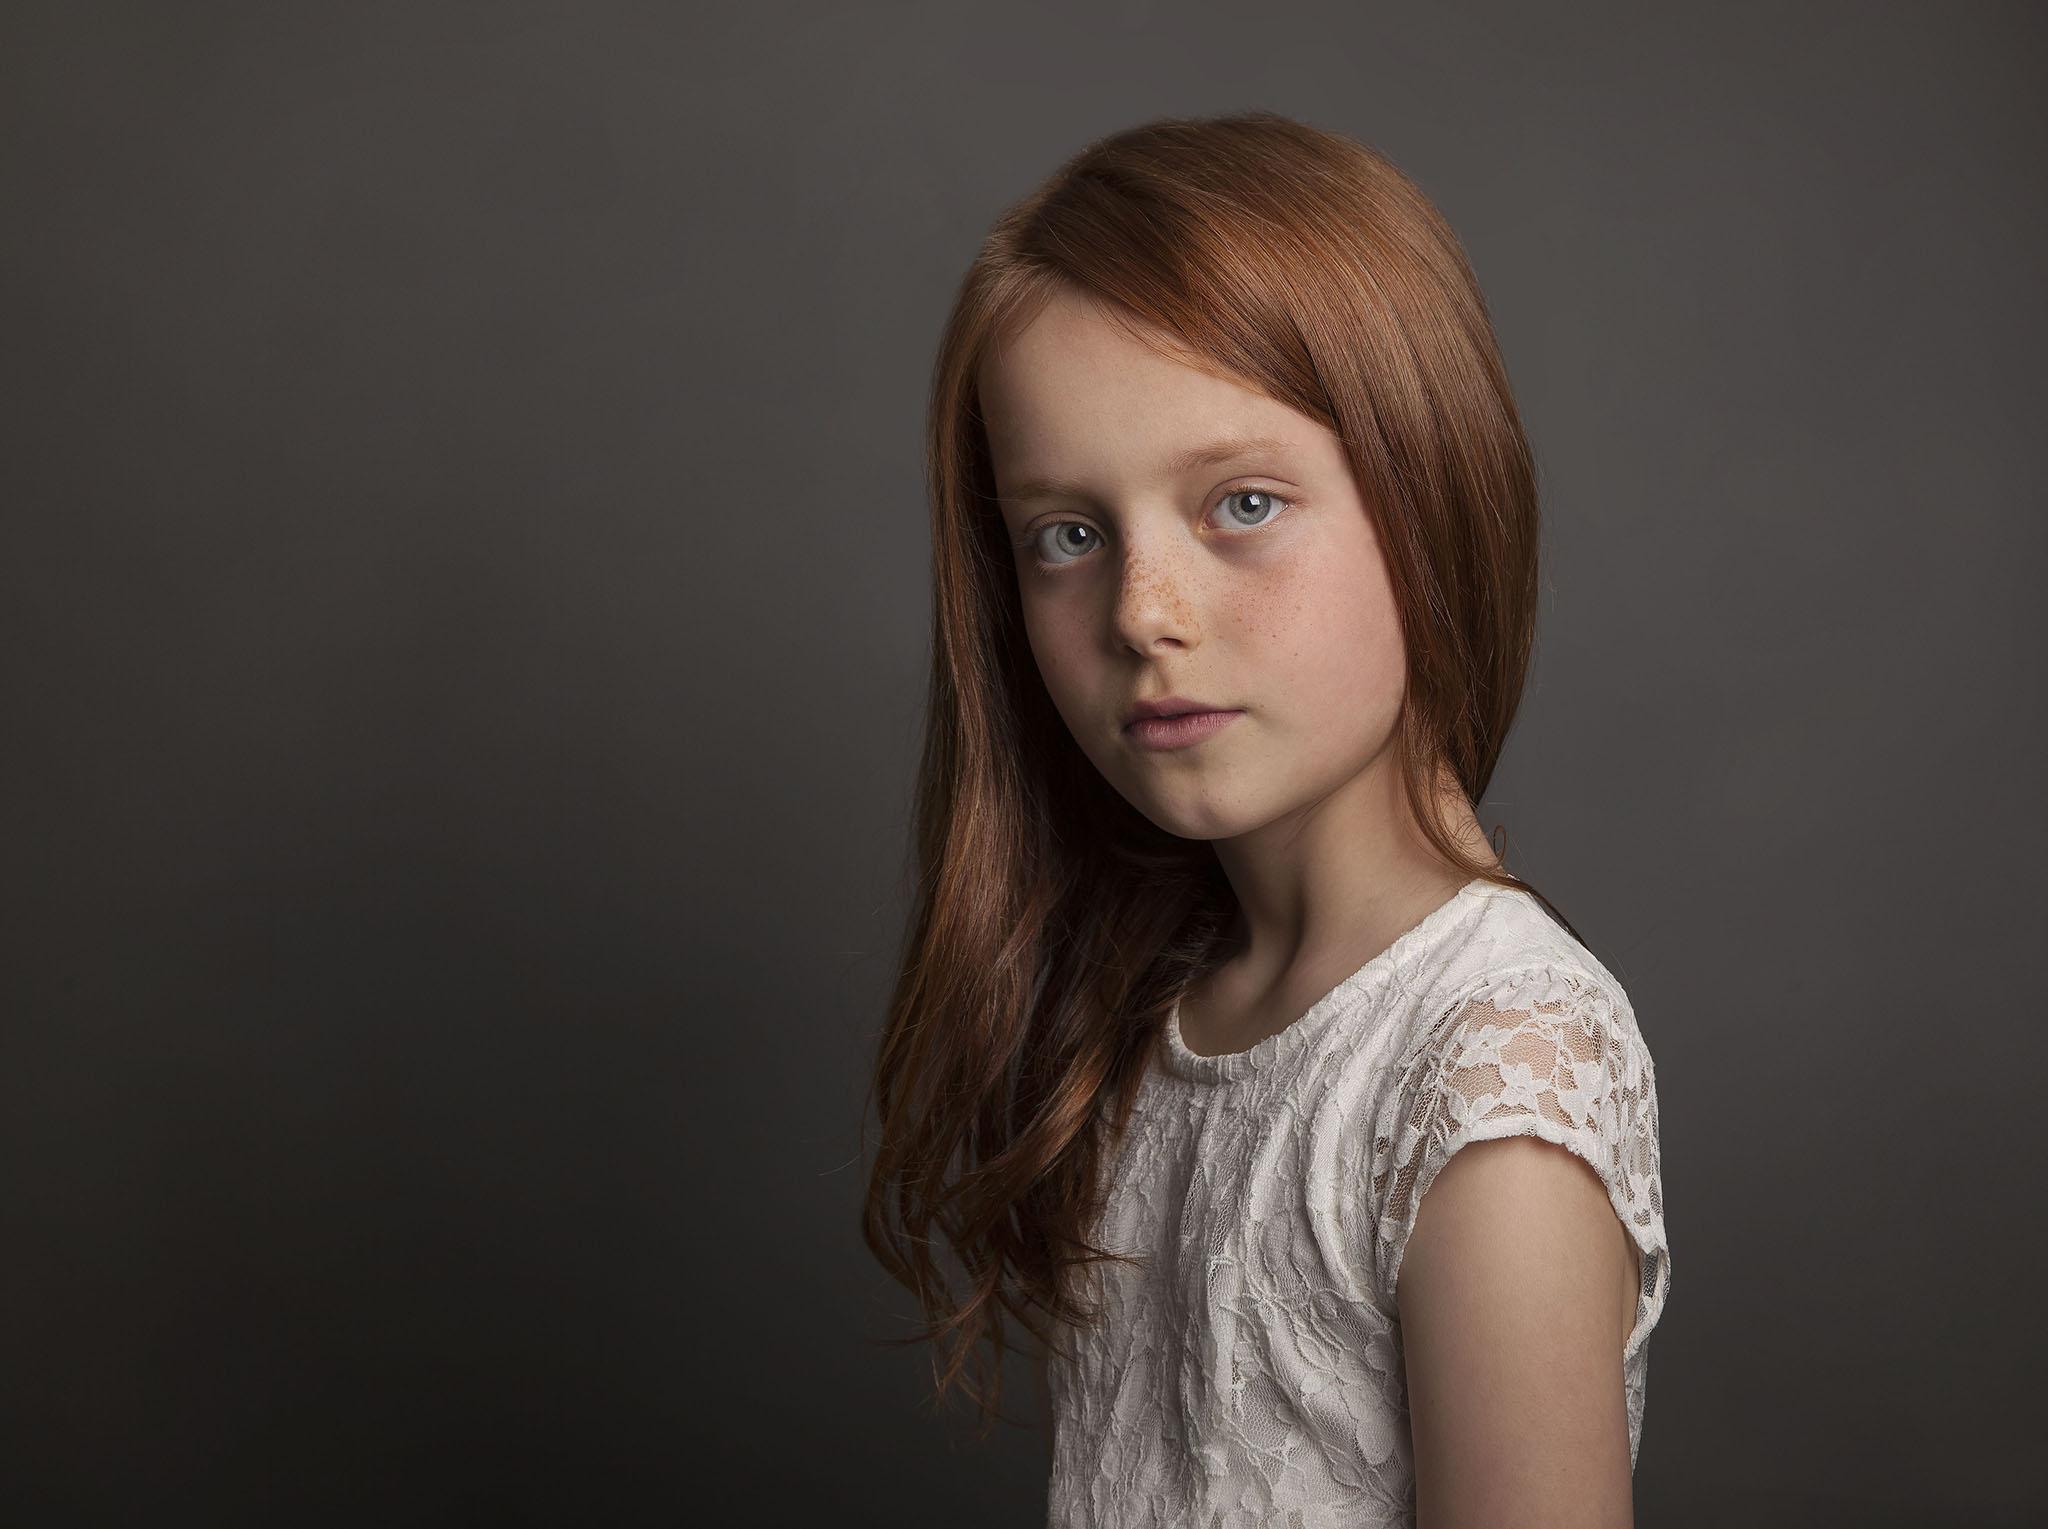 elizabethgphotography_kingslangley_hertfordshire_fineart_childrens_photography_19.jpg